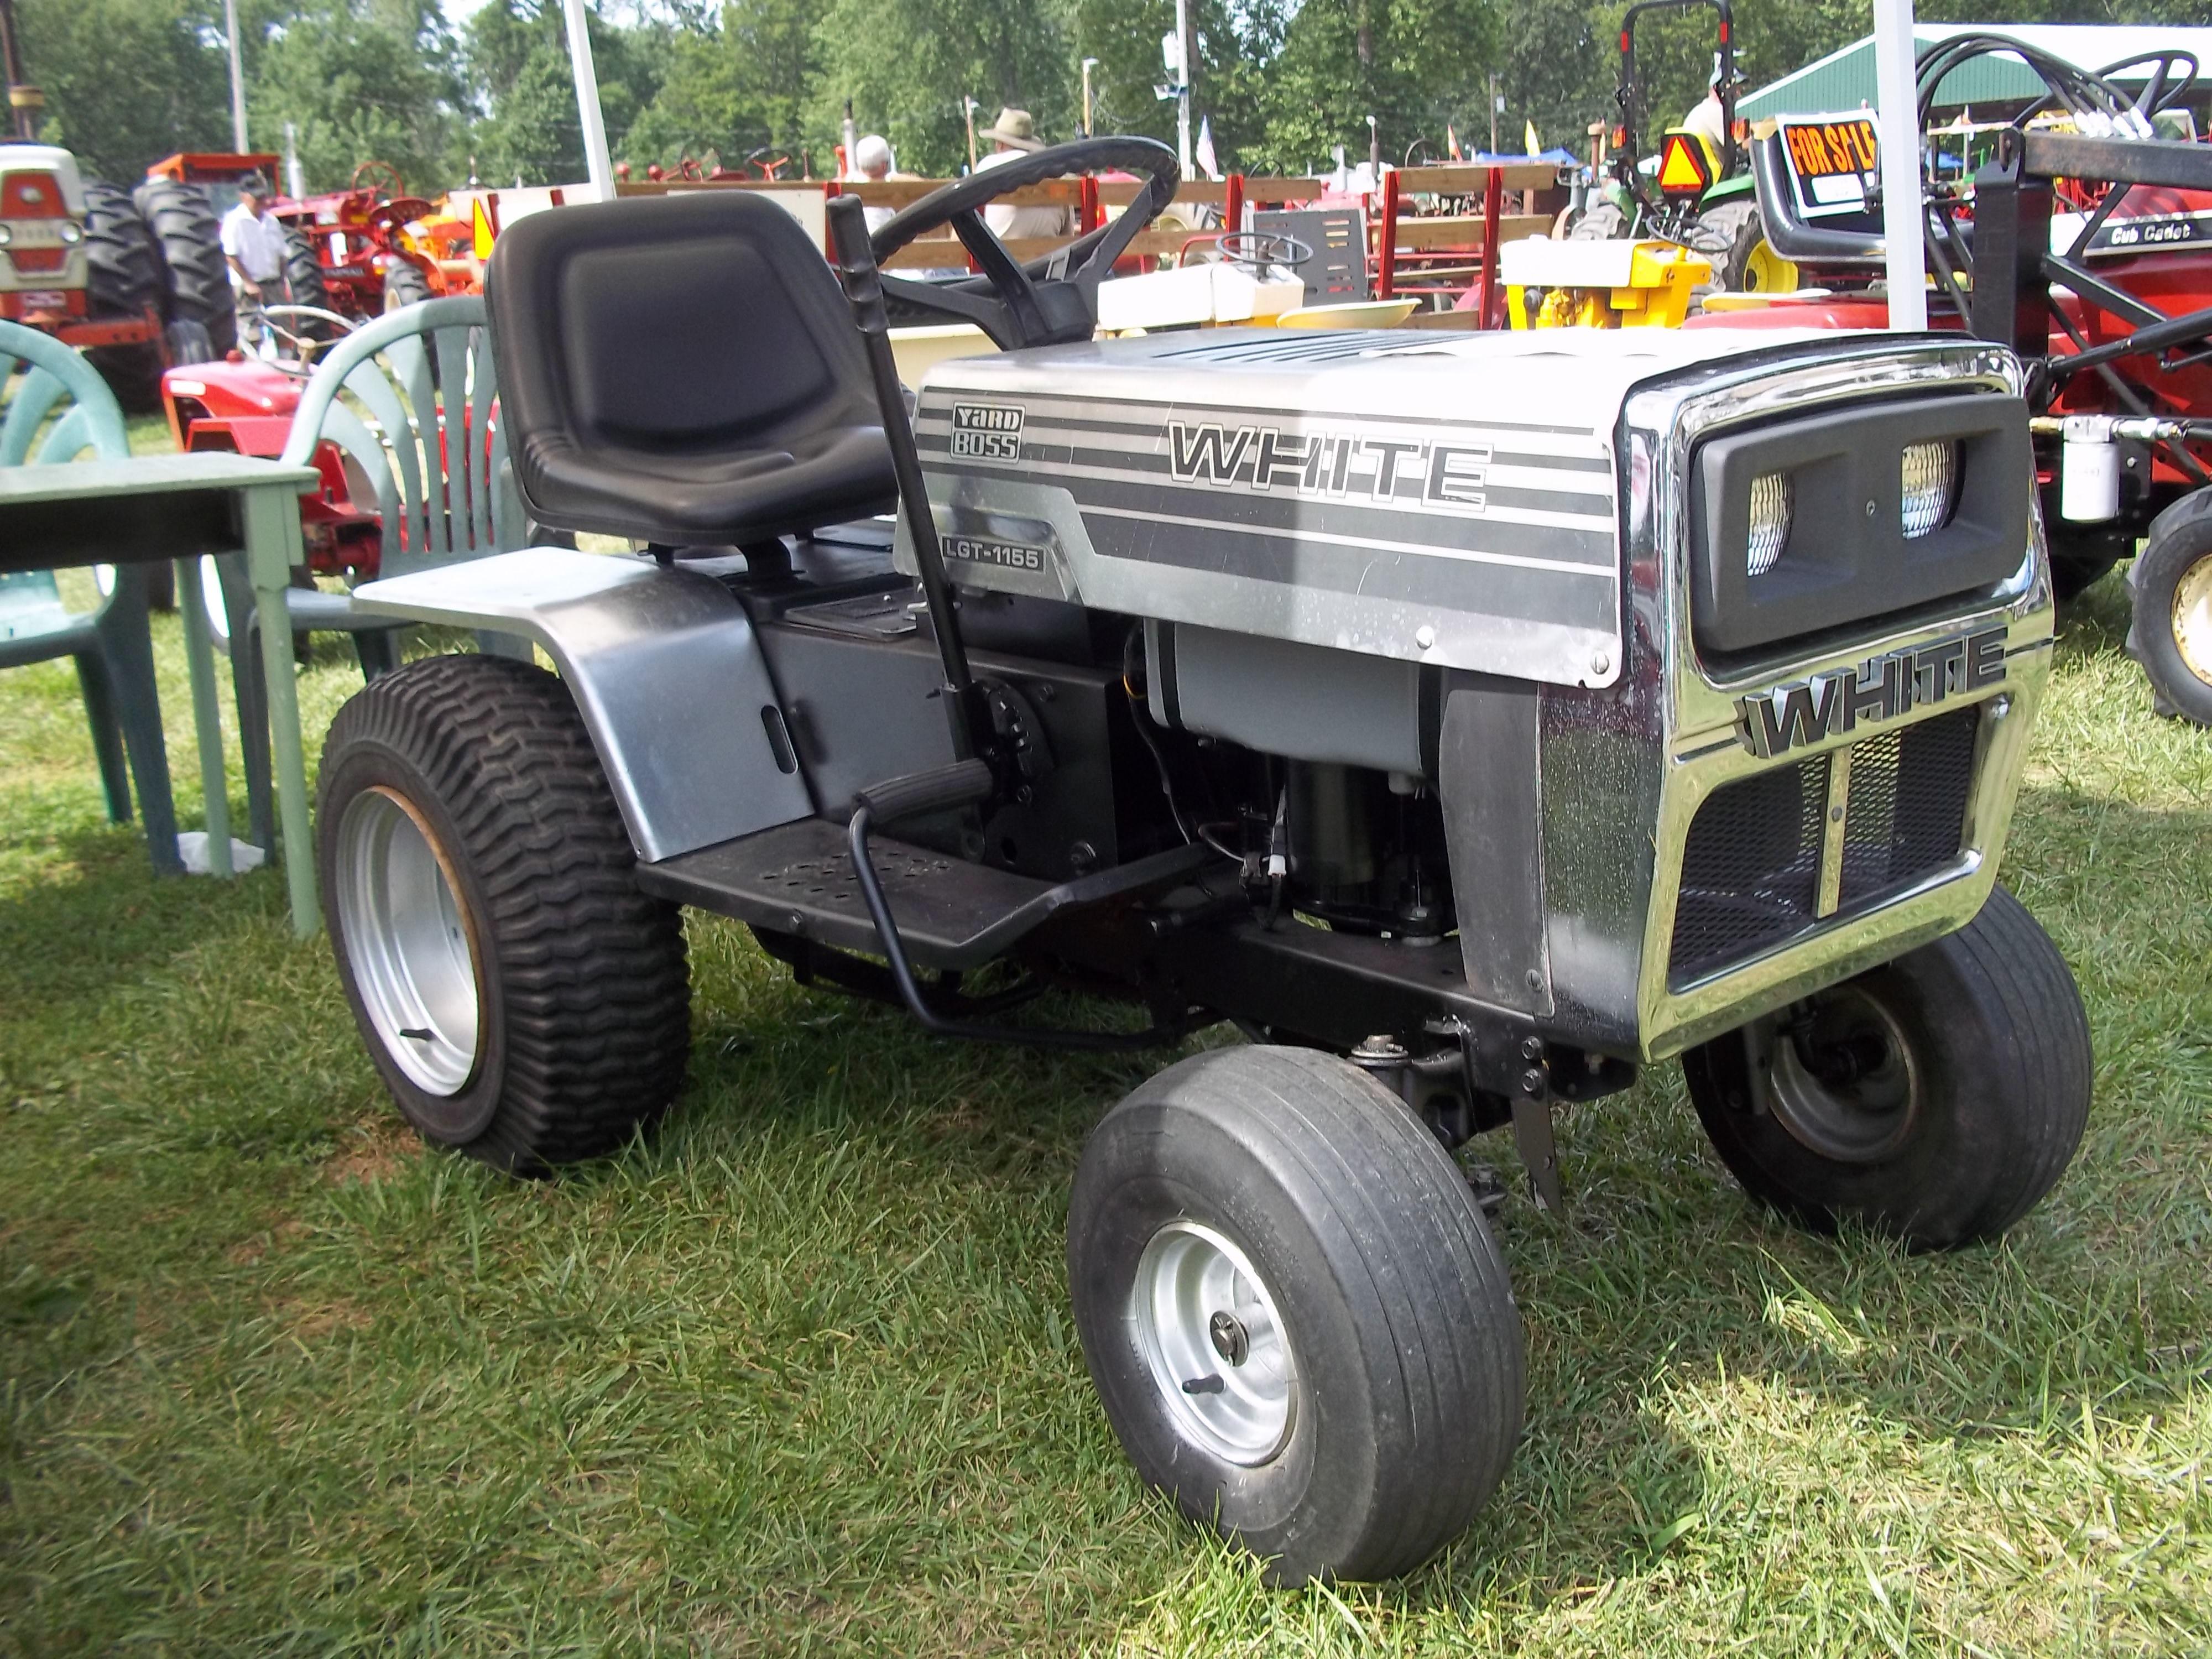 Rare White Garden Tractor White Tractor Garden Tractor Tractors